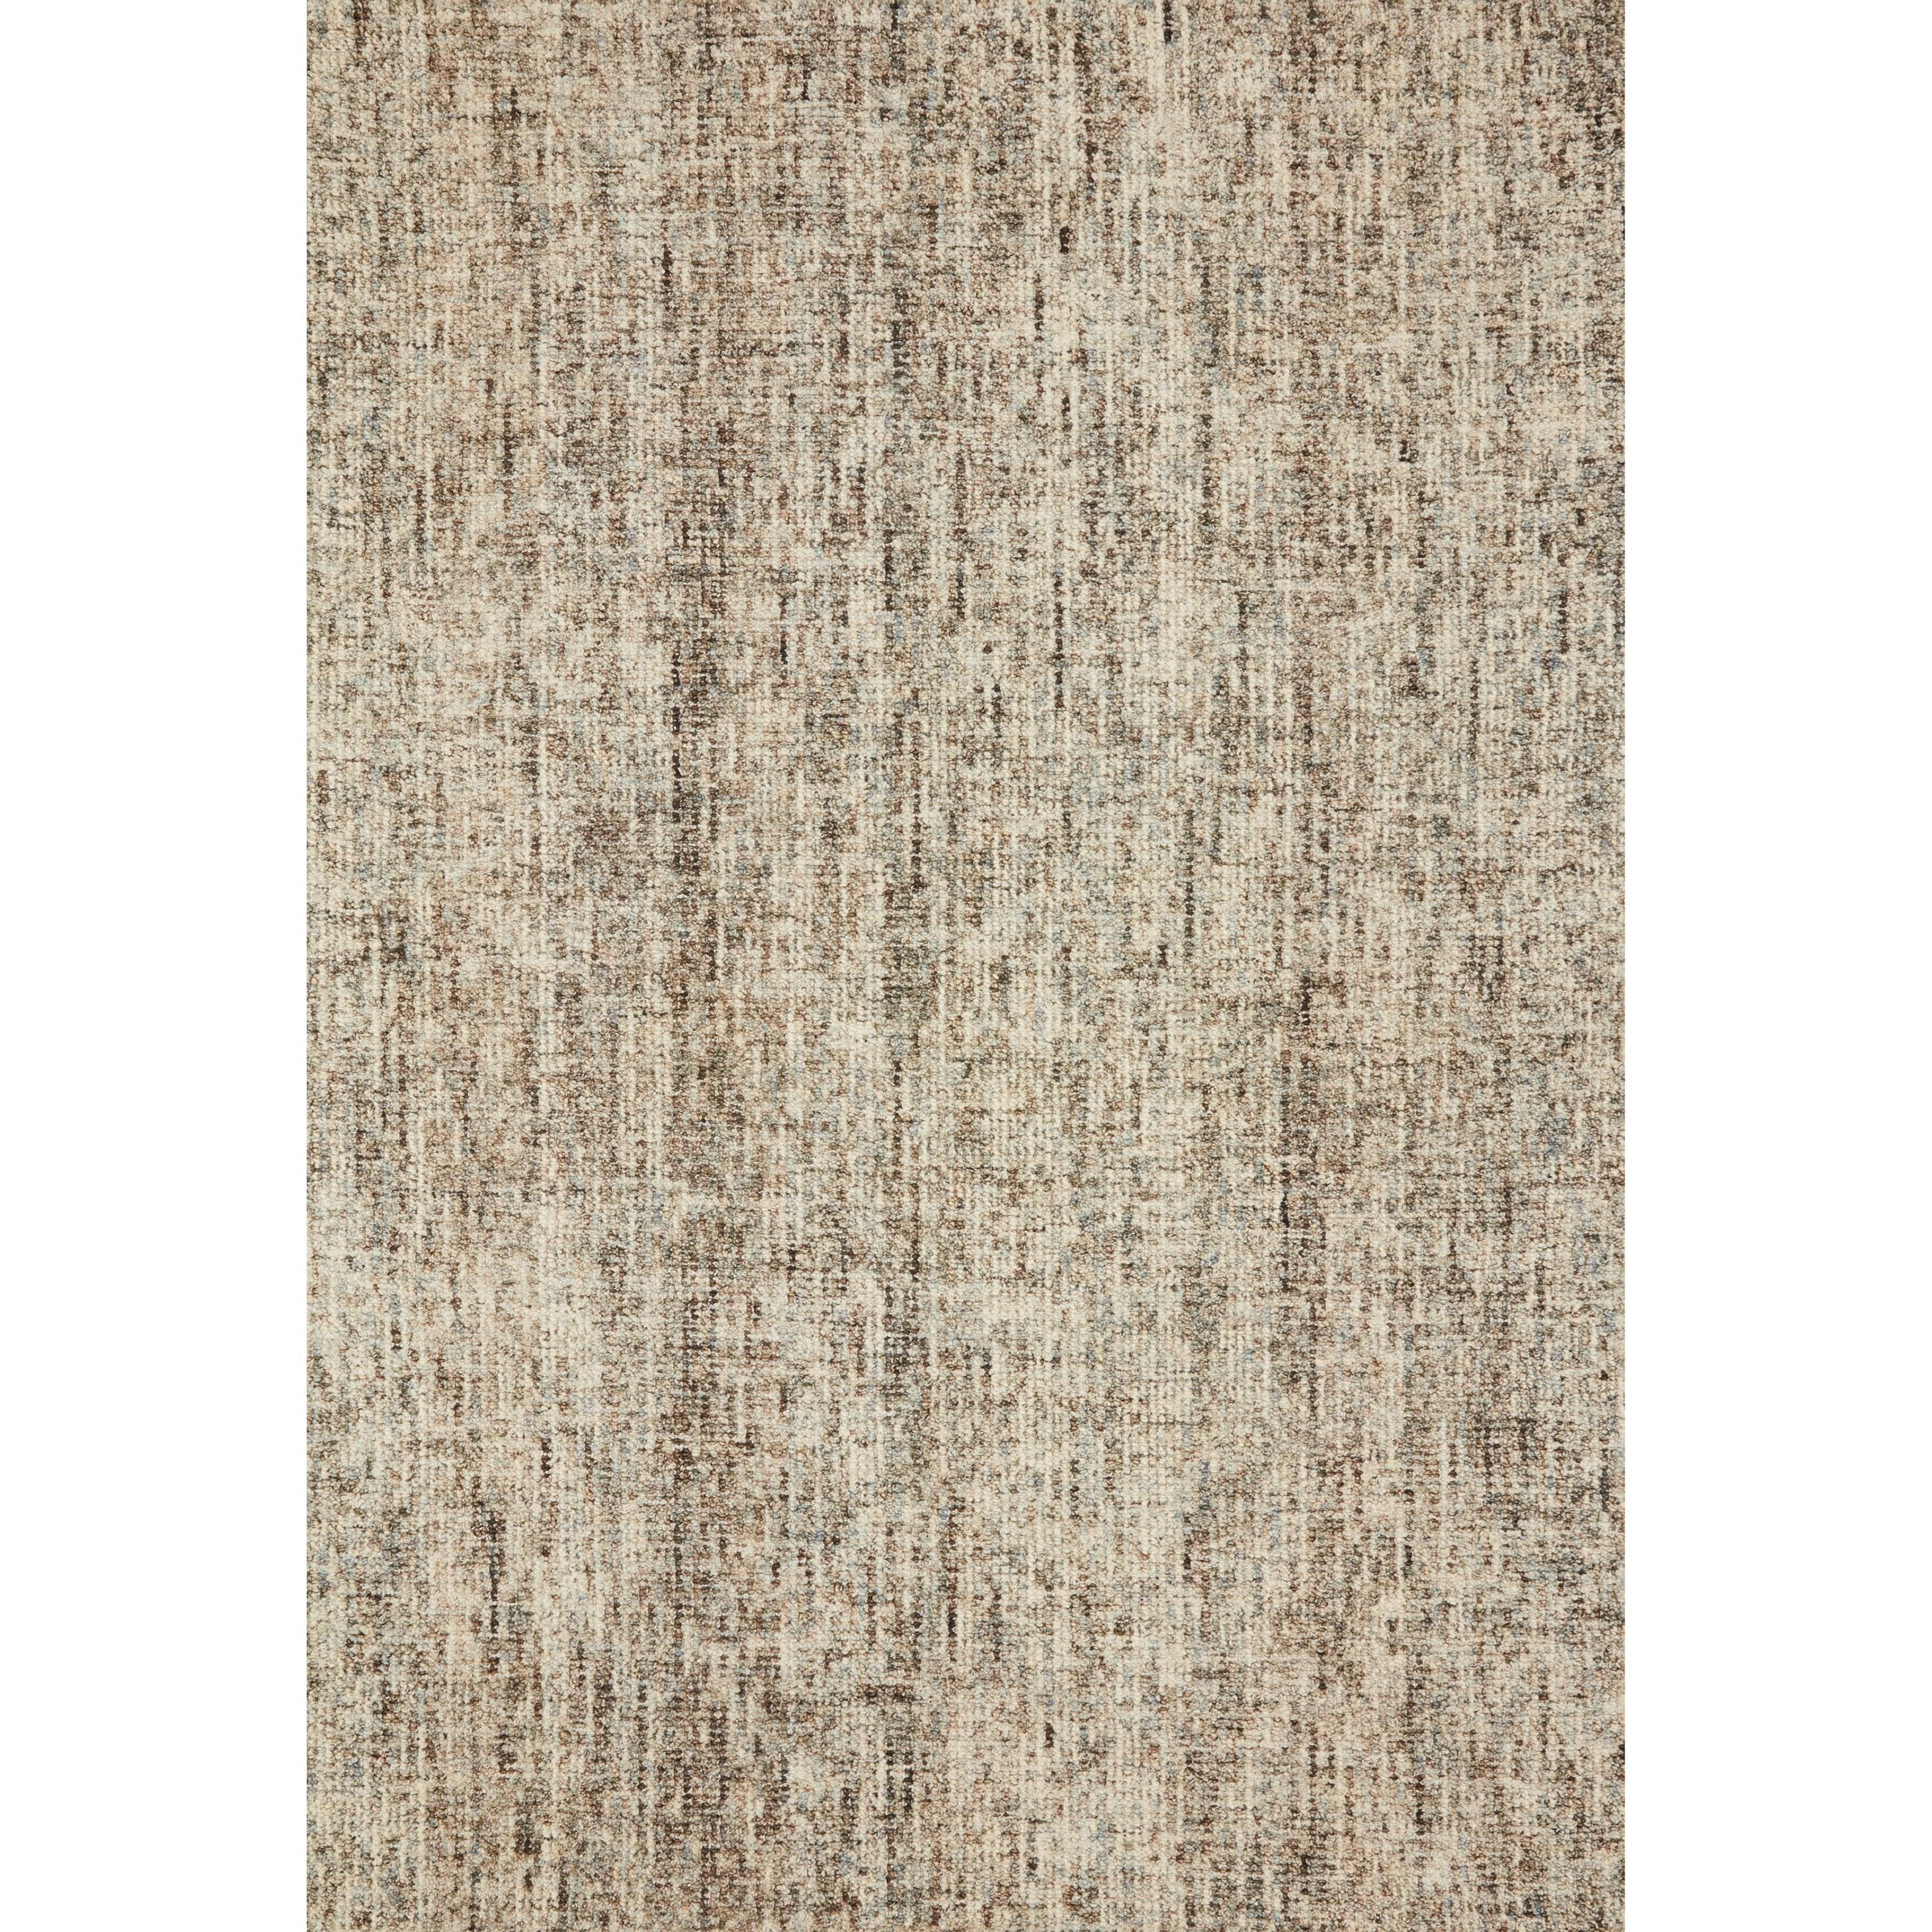 "Harlow 9'3"" x 13' Mocha / Mist Rug by Loloi Rugs at Virginia Furniture Market"